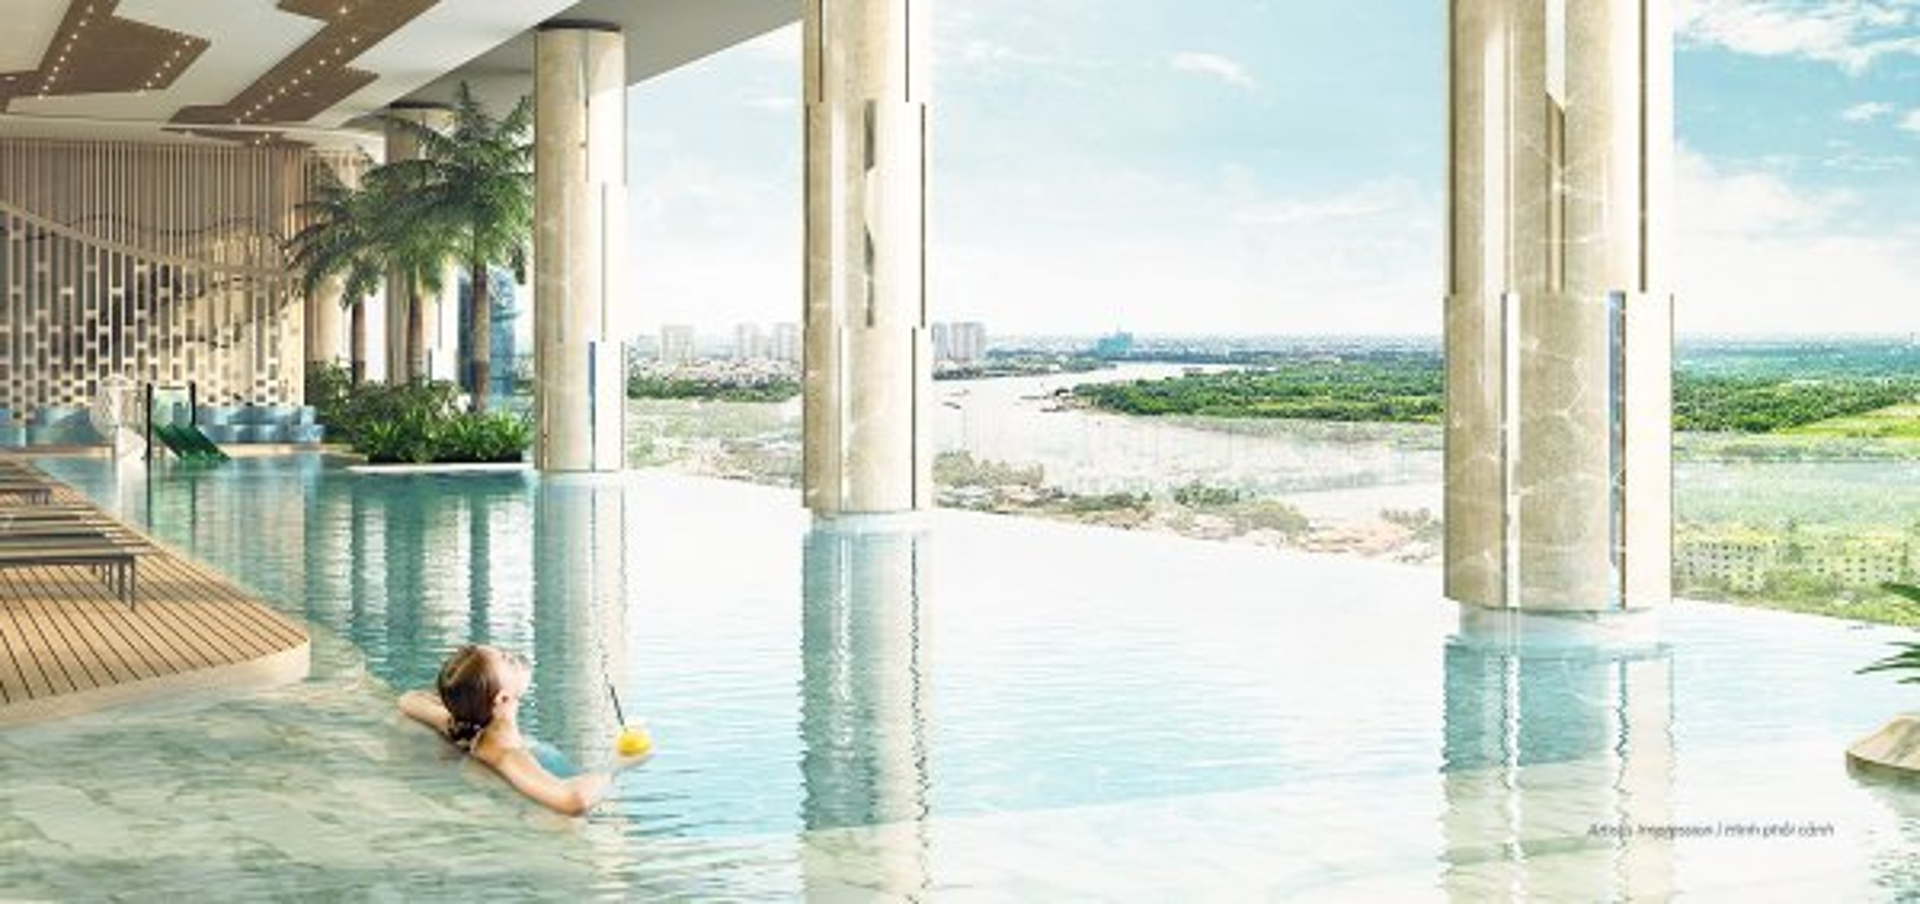 360-image-CGI-perspective-swimming-pool